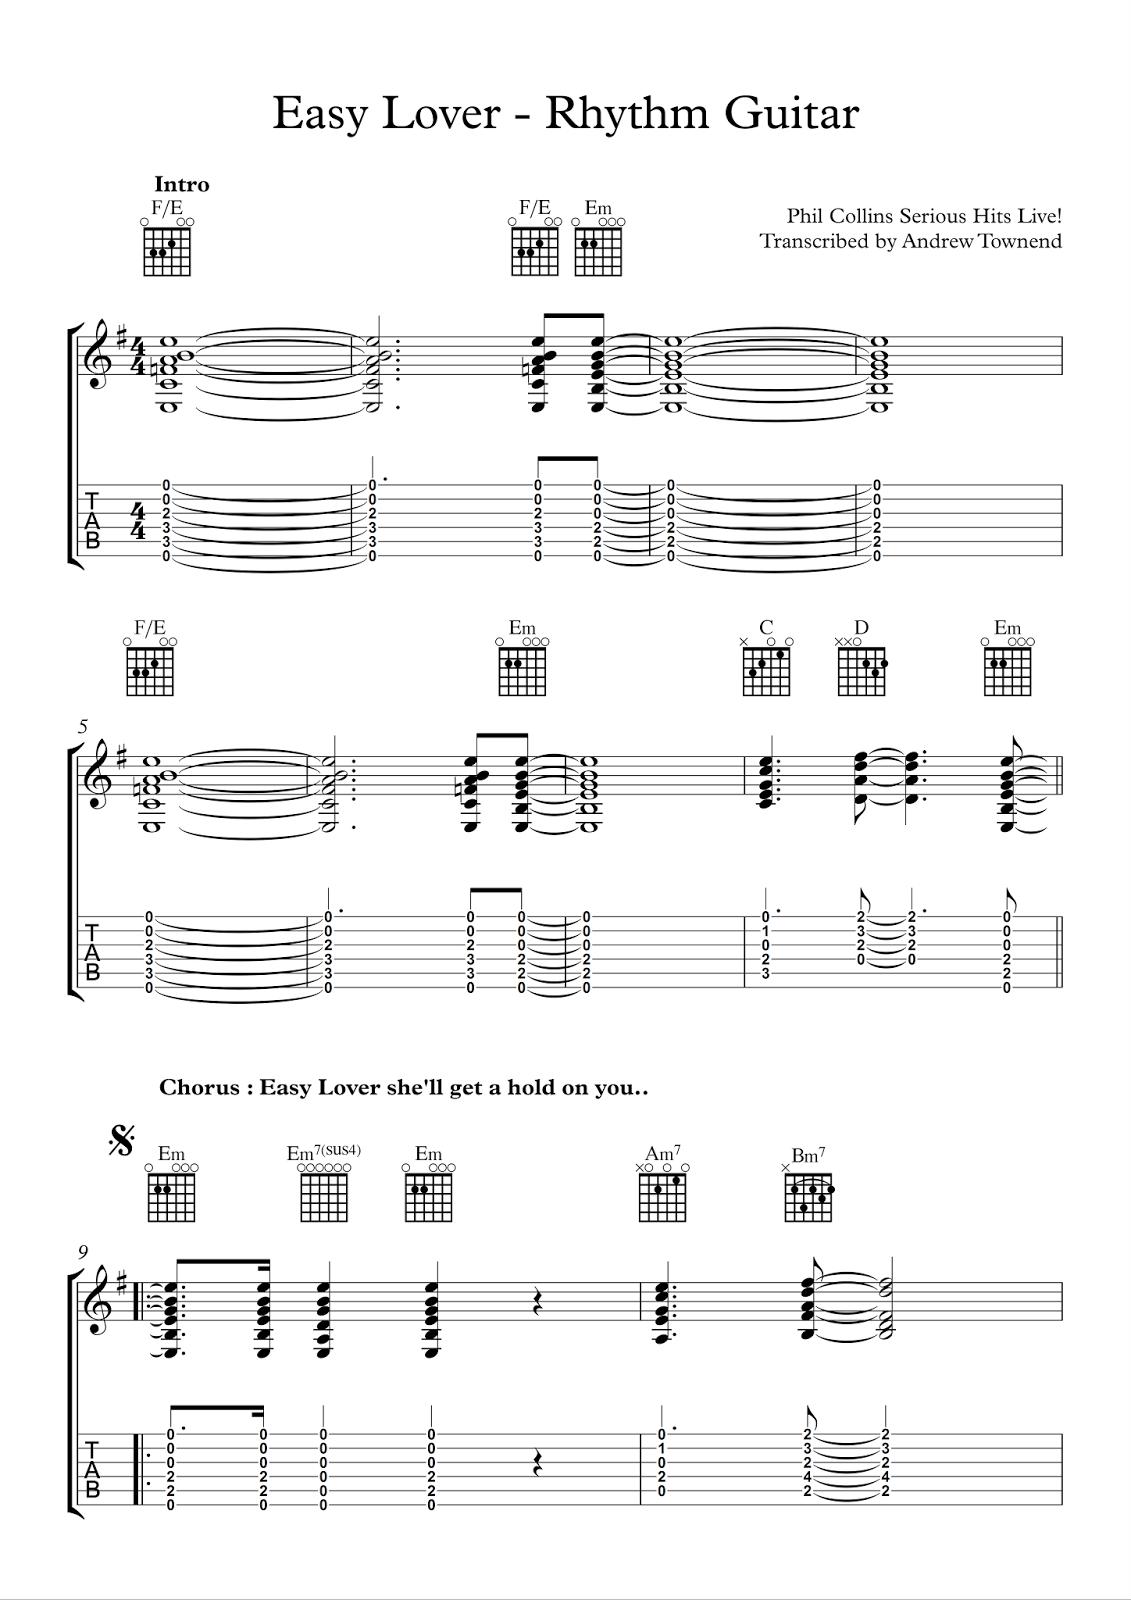 Easy Lover Rhythm Guitar